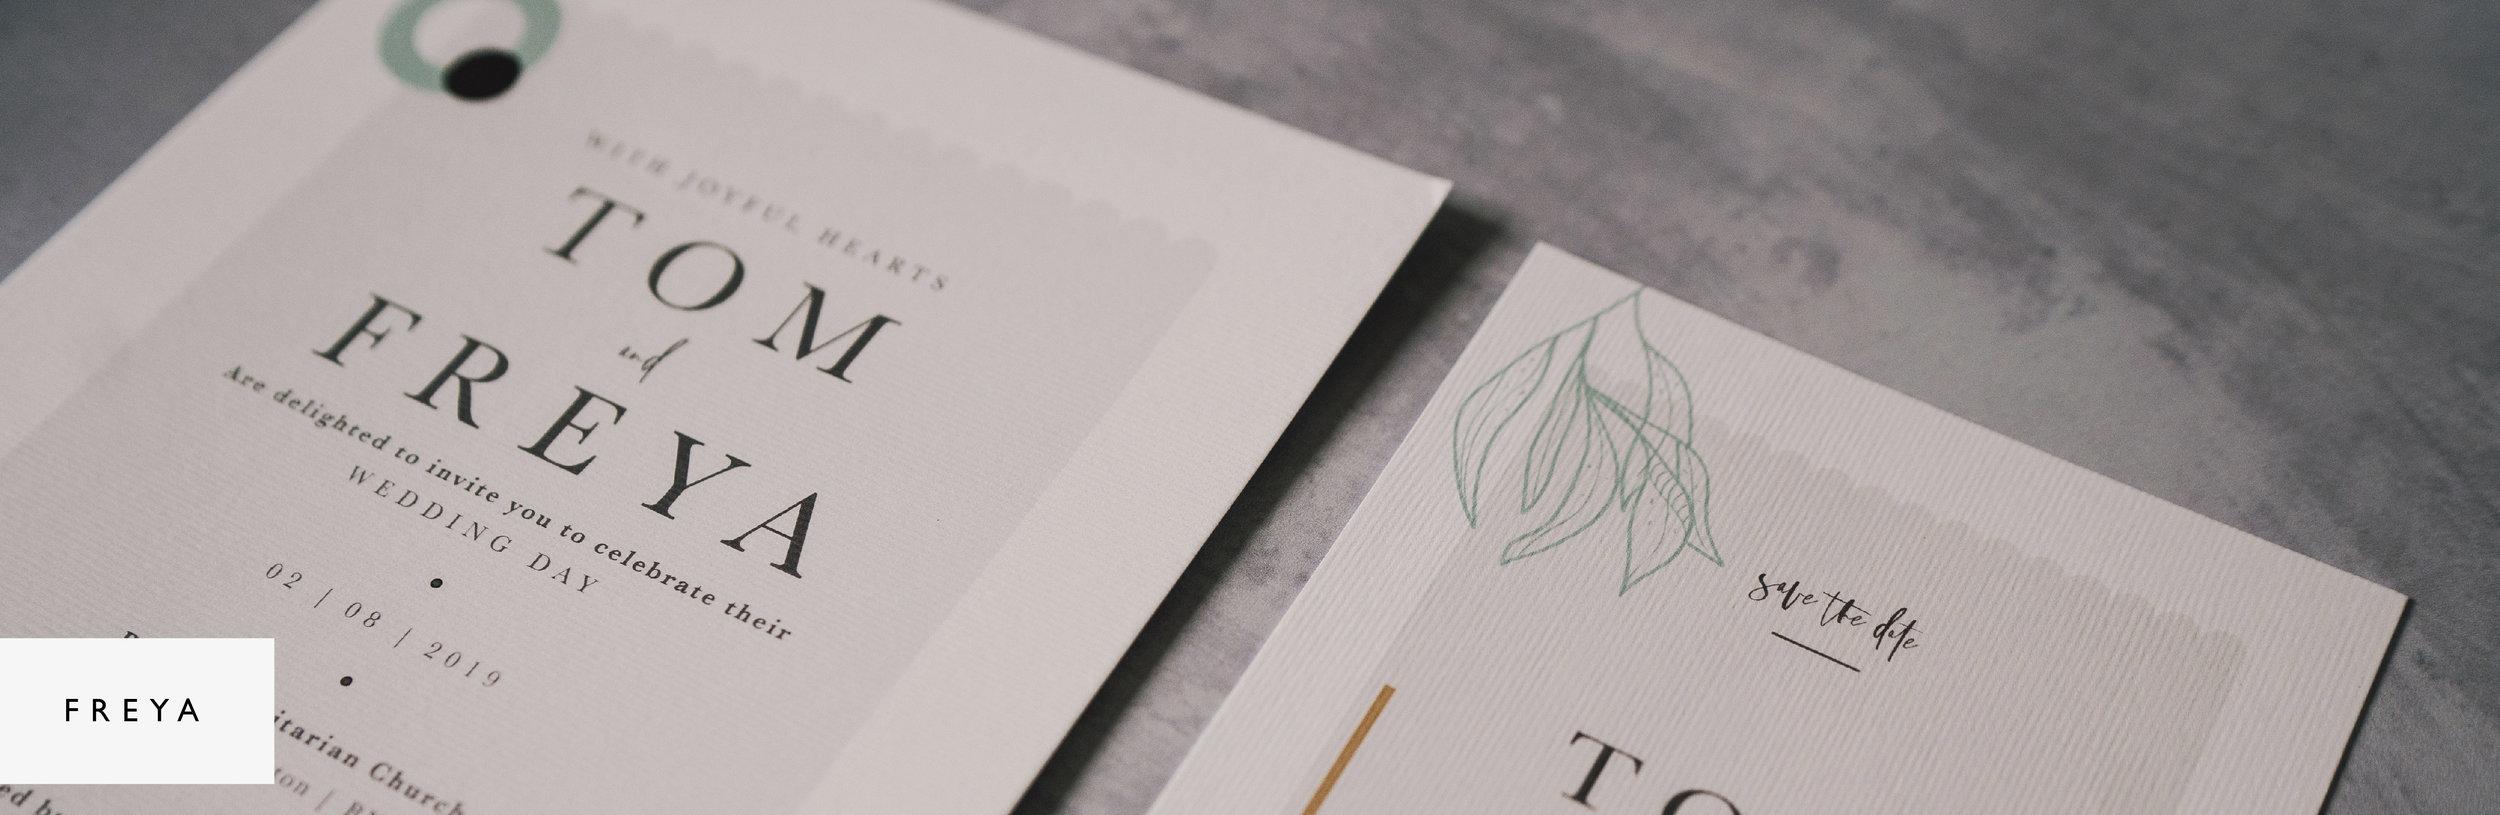 Freya_Wedding_Invitation_Template